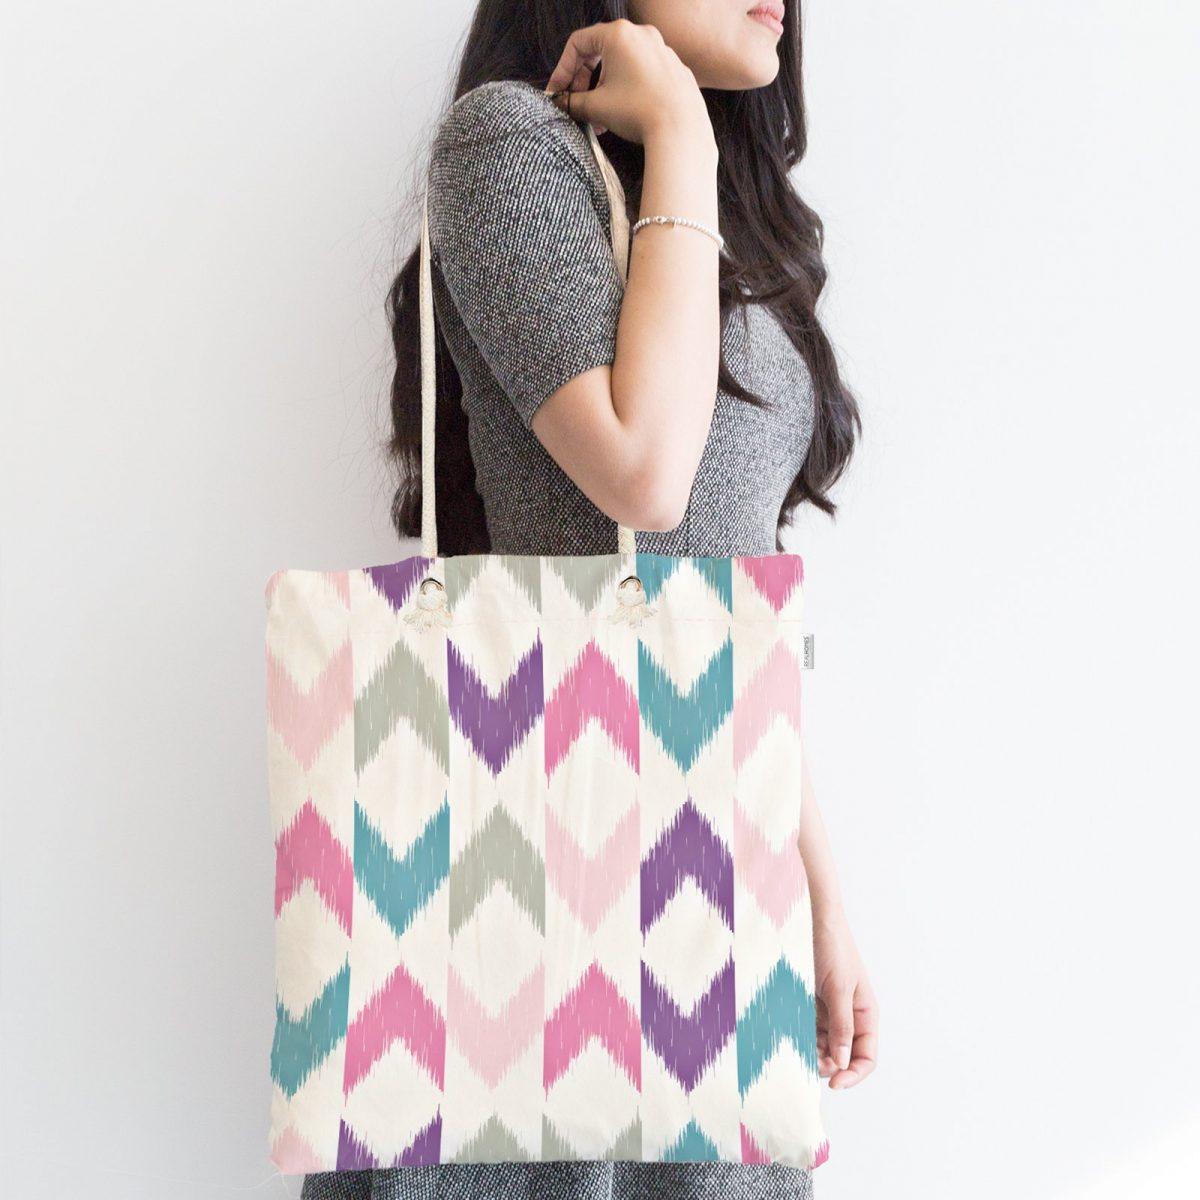 Renkli Zigzaglar Dijital Baskılı Fermuarlı Modern Kumaş Çanta Realhomes